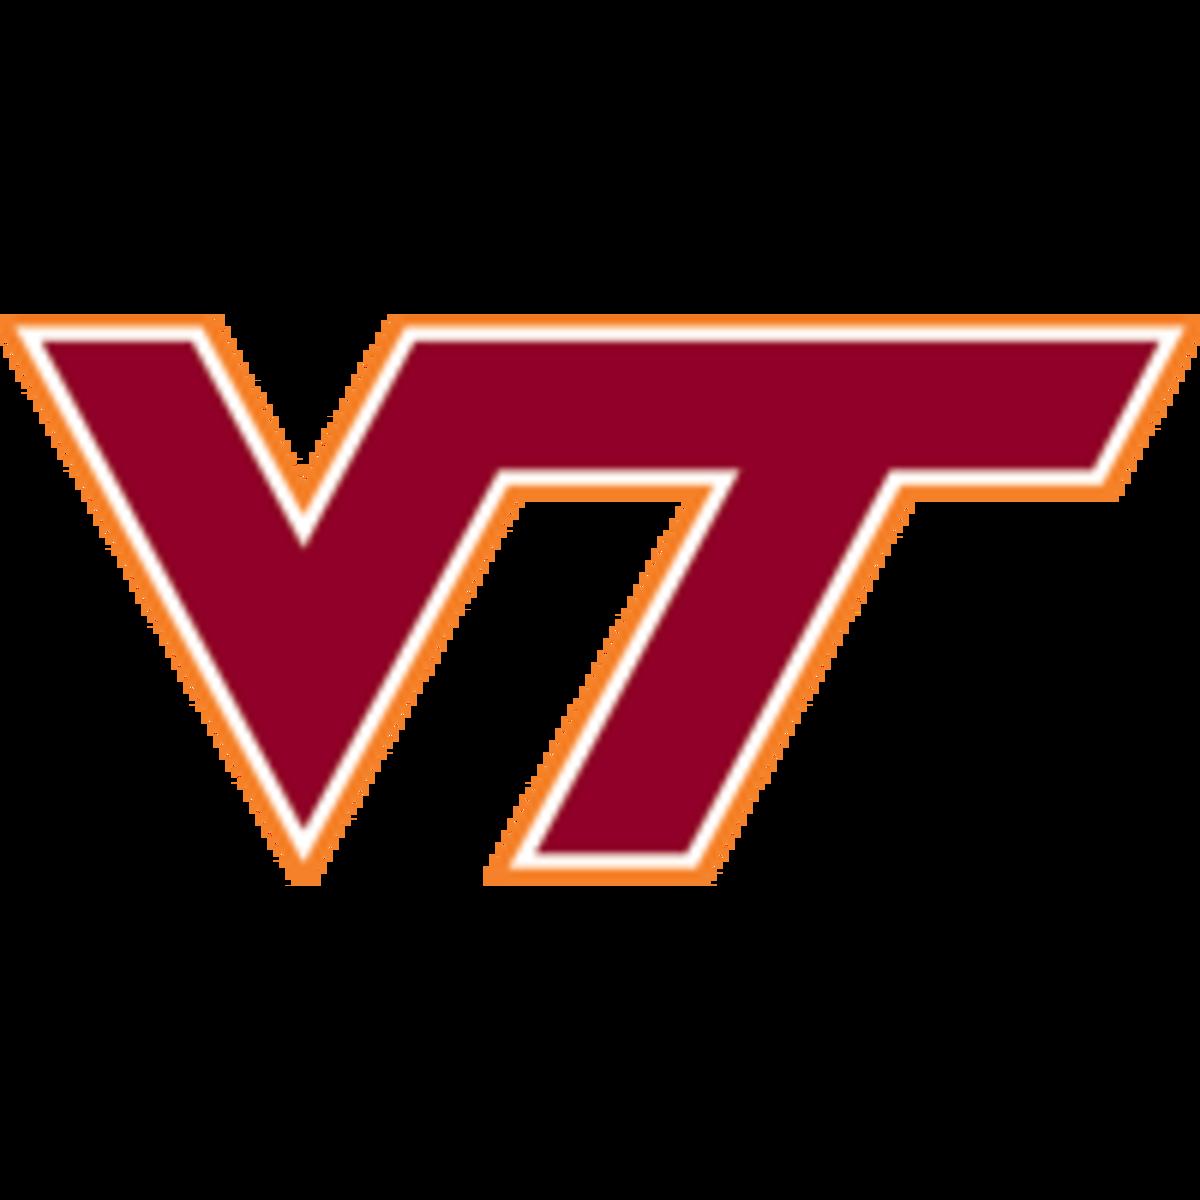 College Football Top 25 Rankings: Virginia Tech